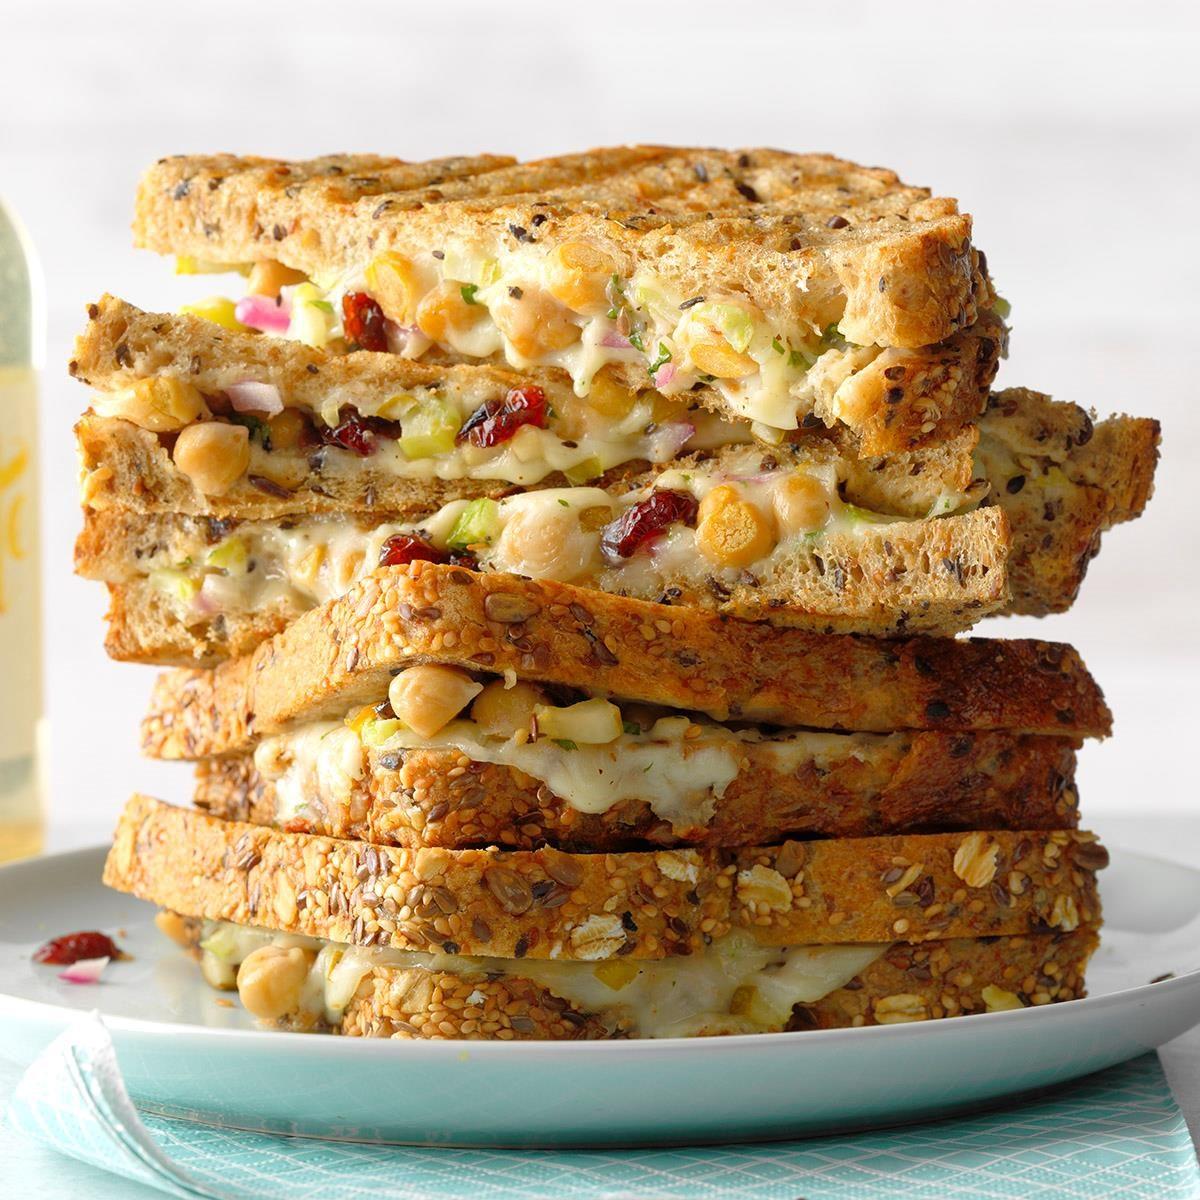 Runner-Up: Grilled Chickpea Salad Sandwich